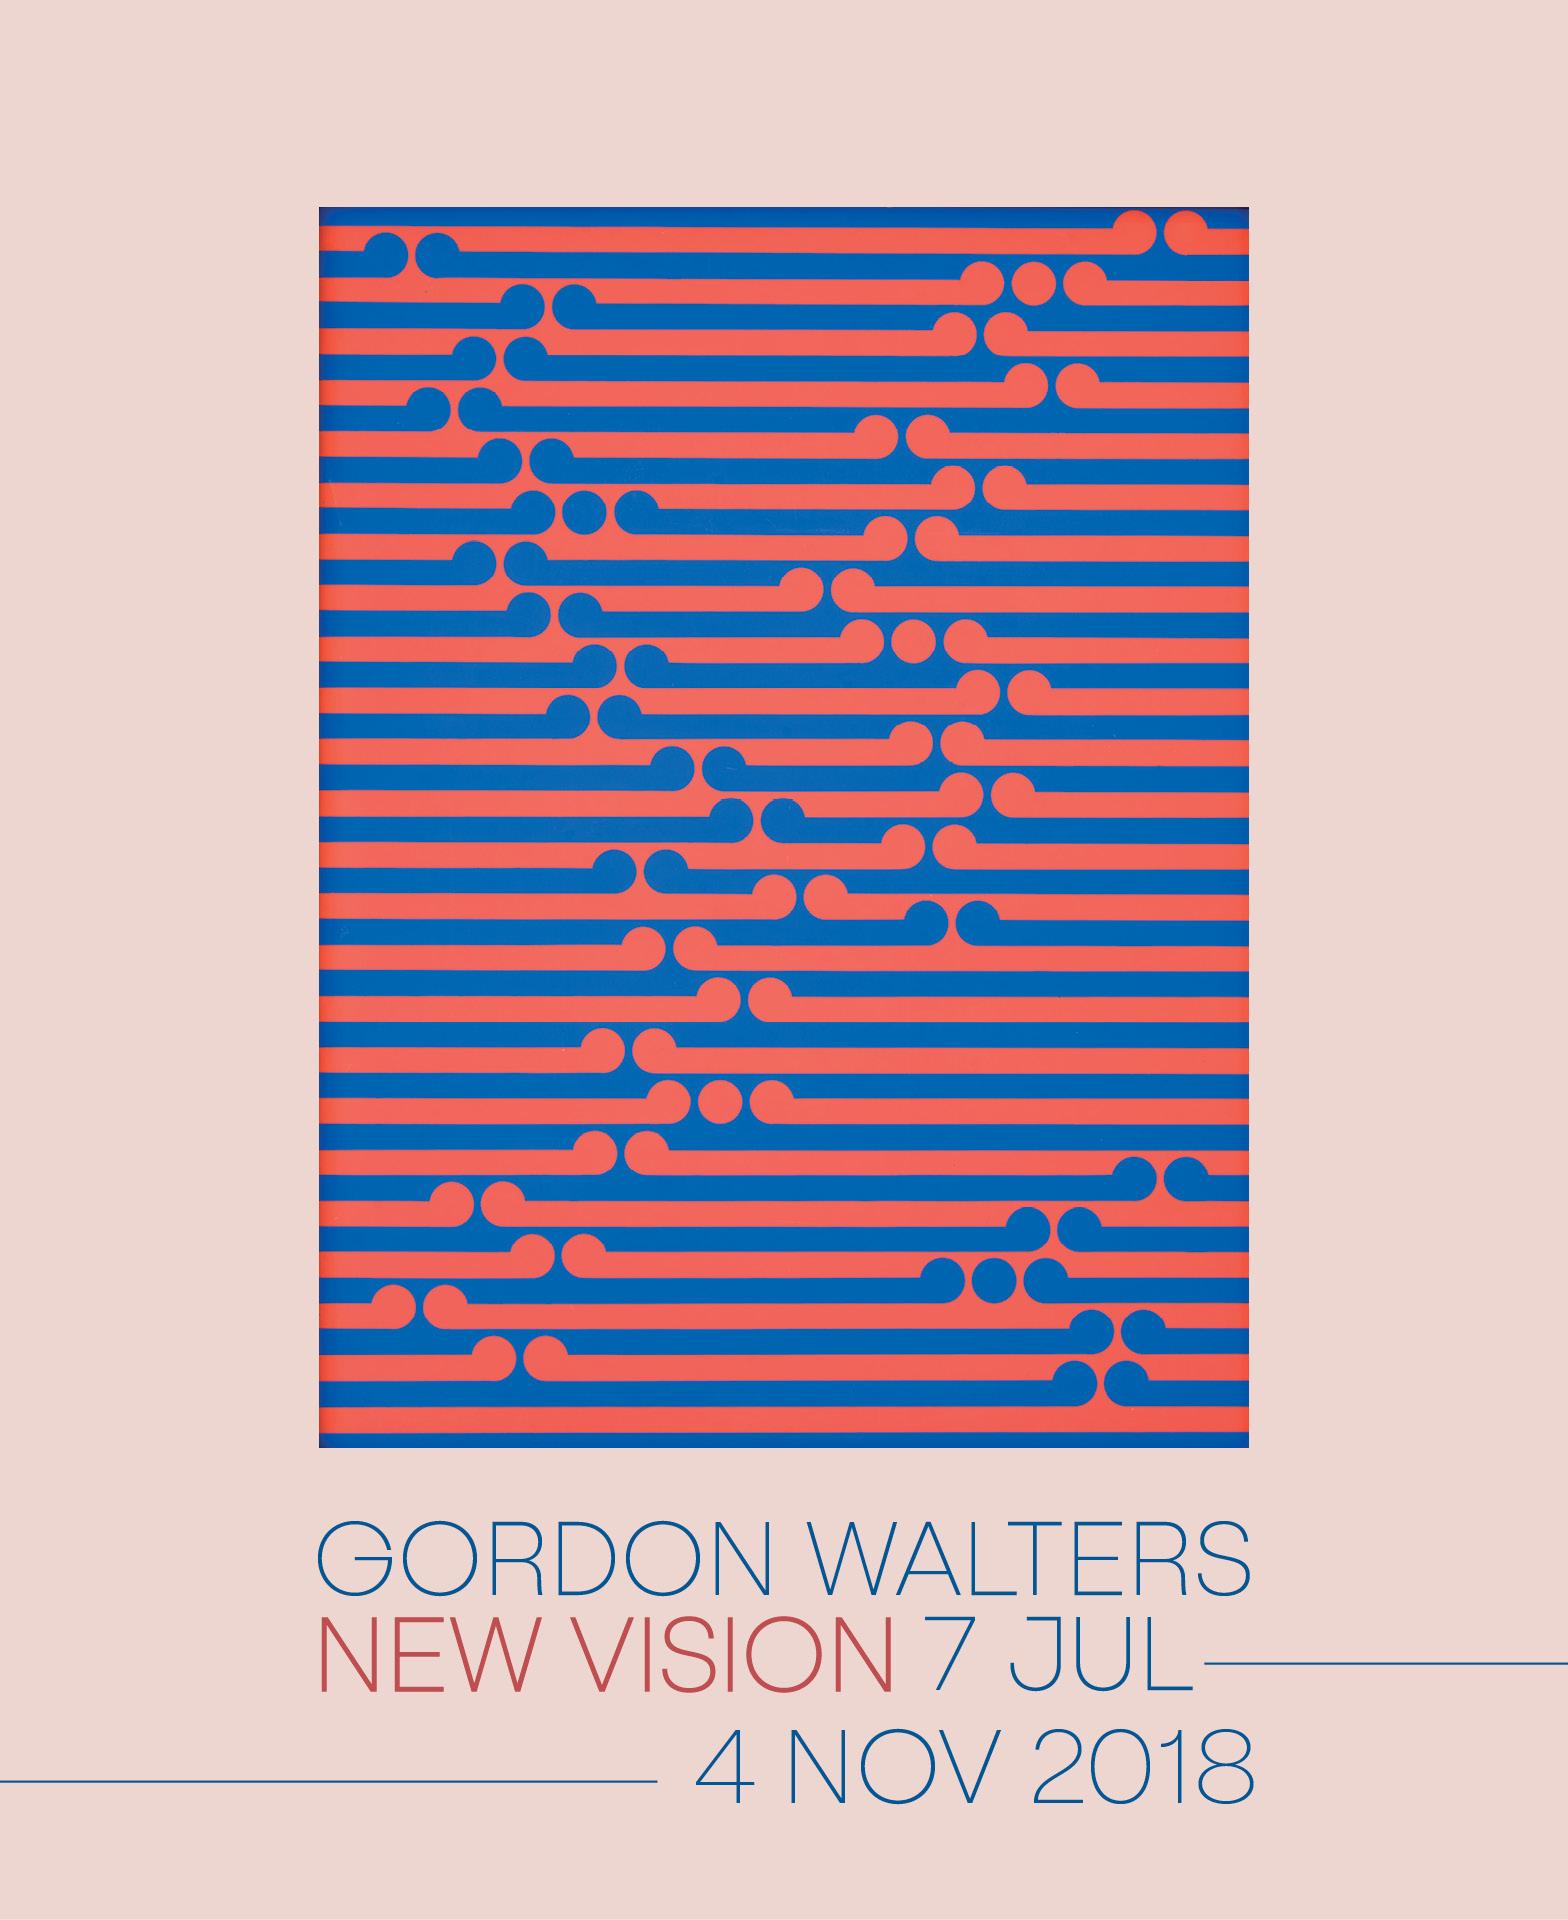 Gordon Walters: New Vision